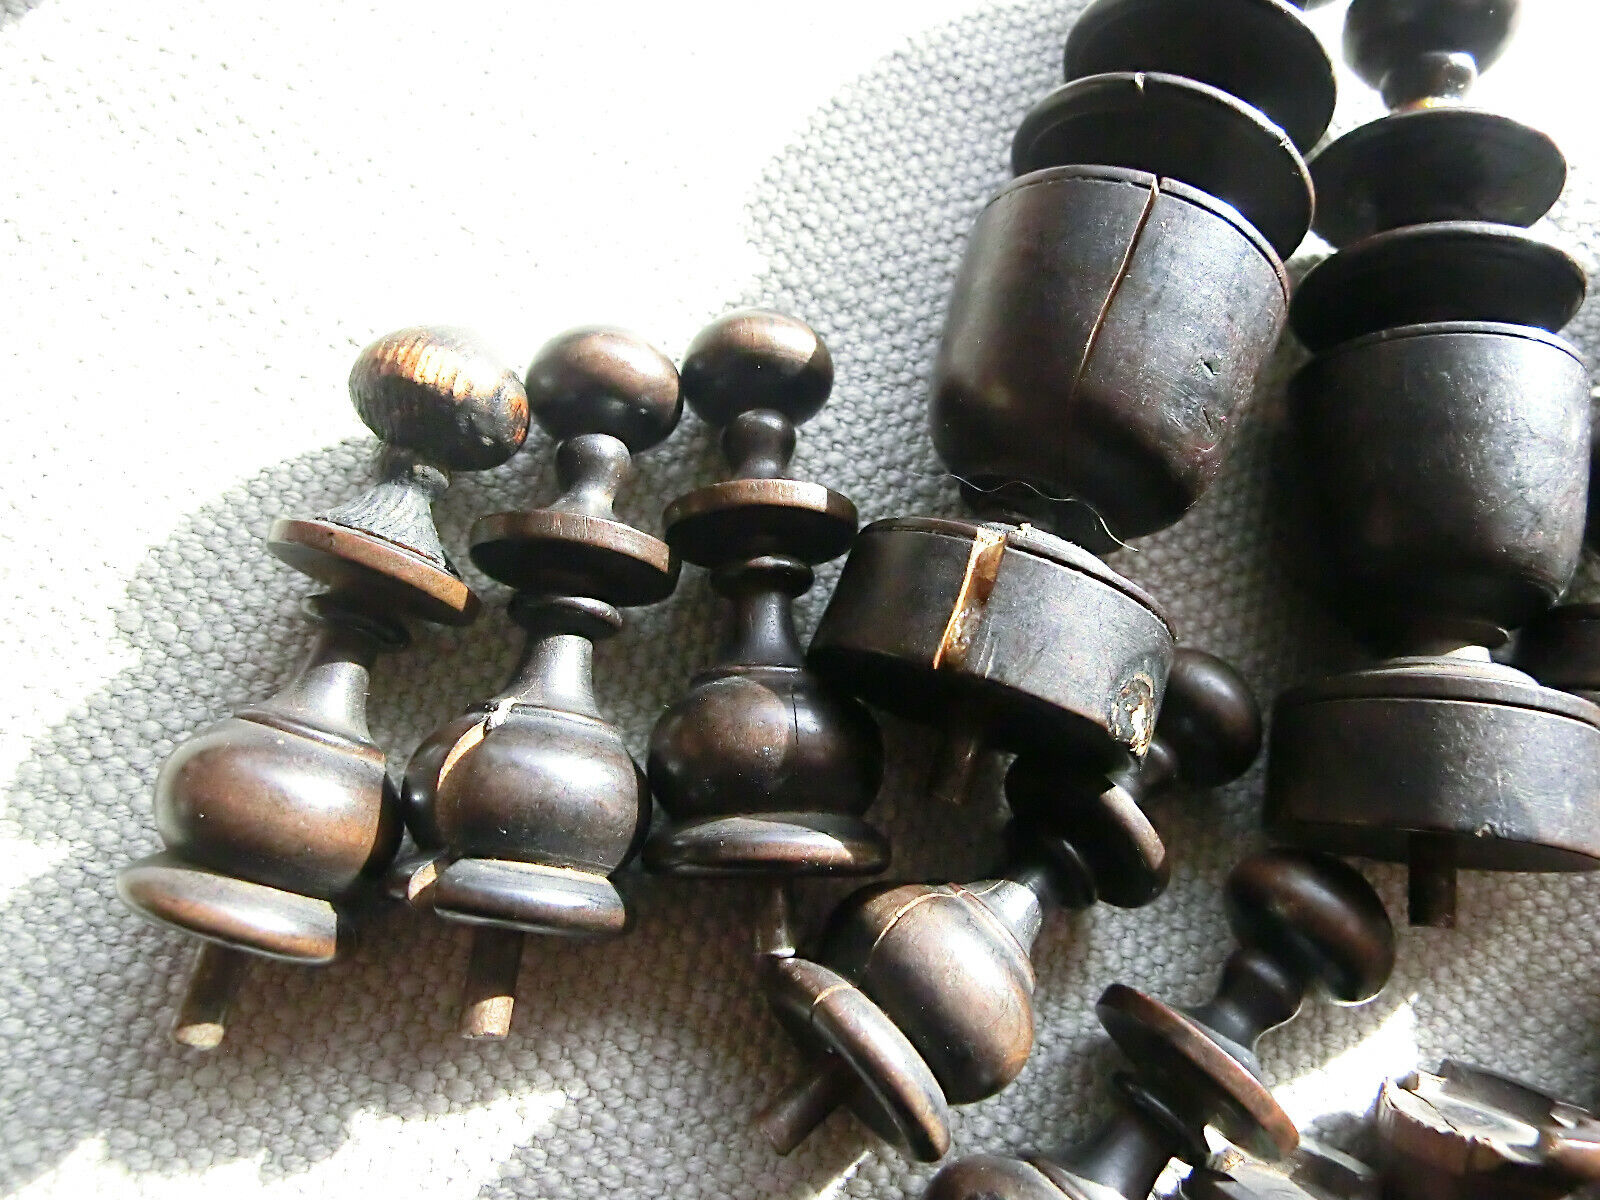 "ANTIQUE CHESSMEN TRAVEL CHESS CHESS CHESS METAL PINS COMPENDIUM 3"" KING REGENCE PATTERN 8eb1bc"